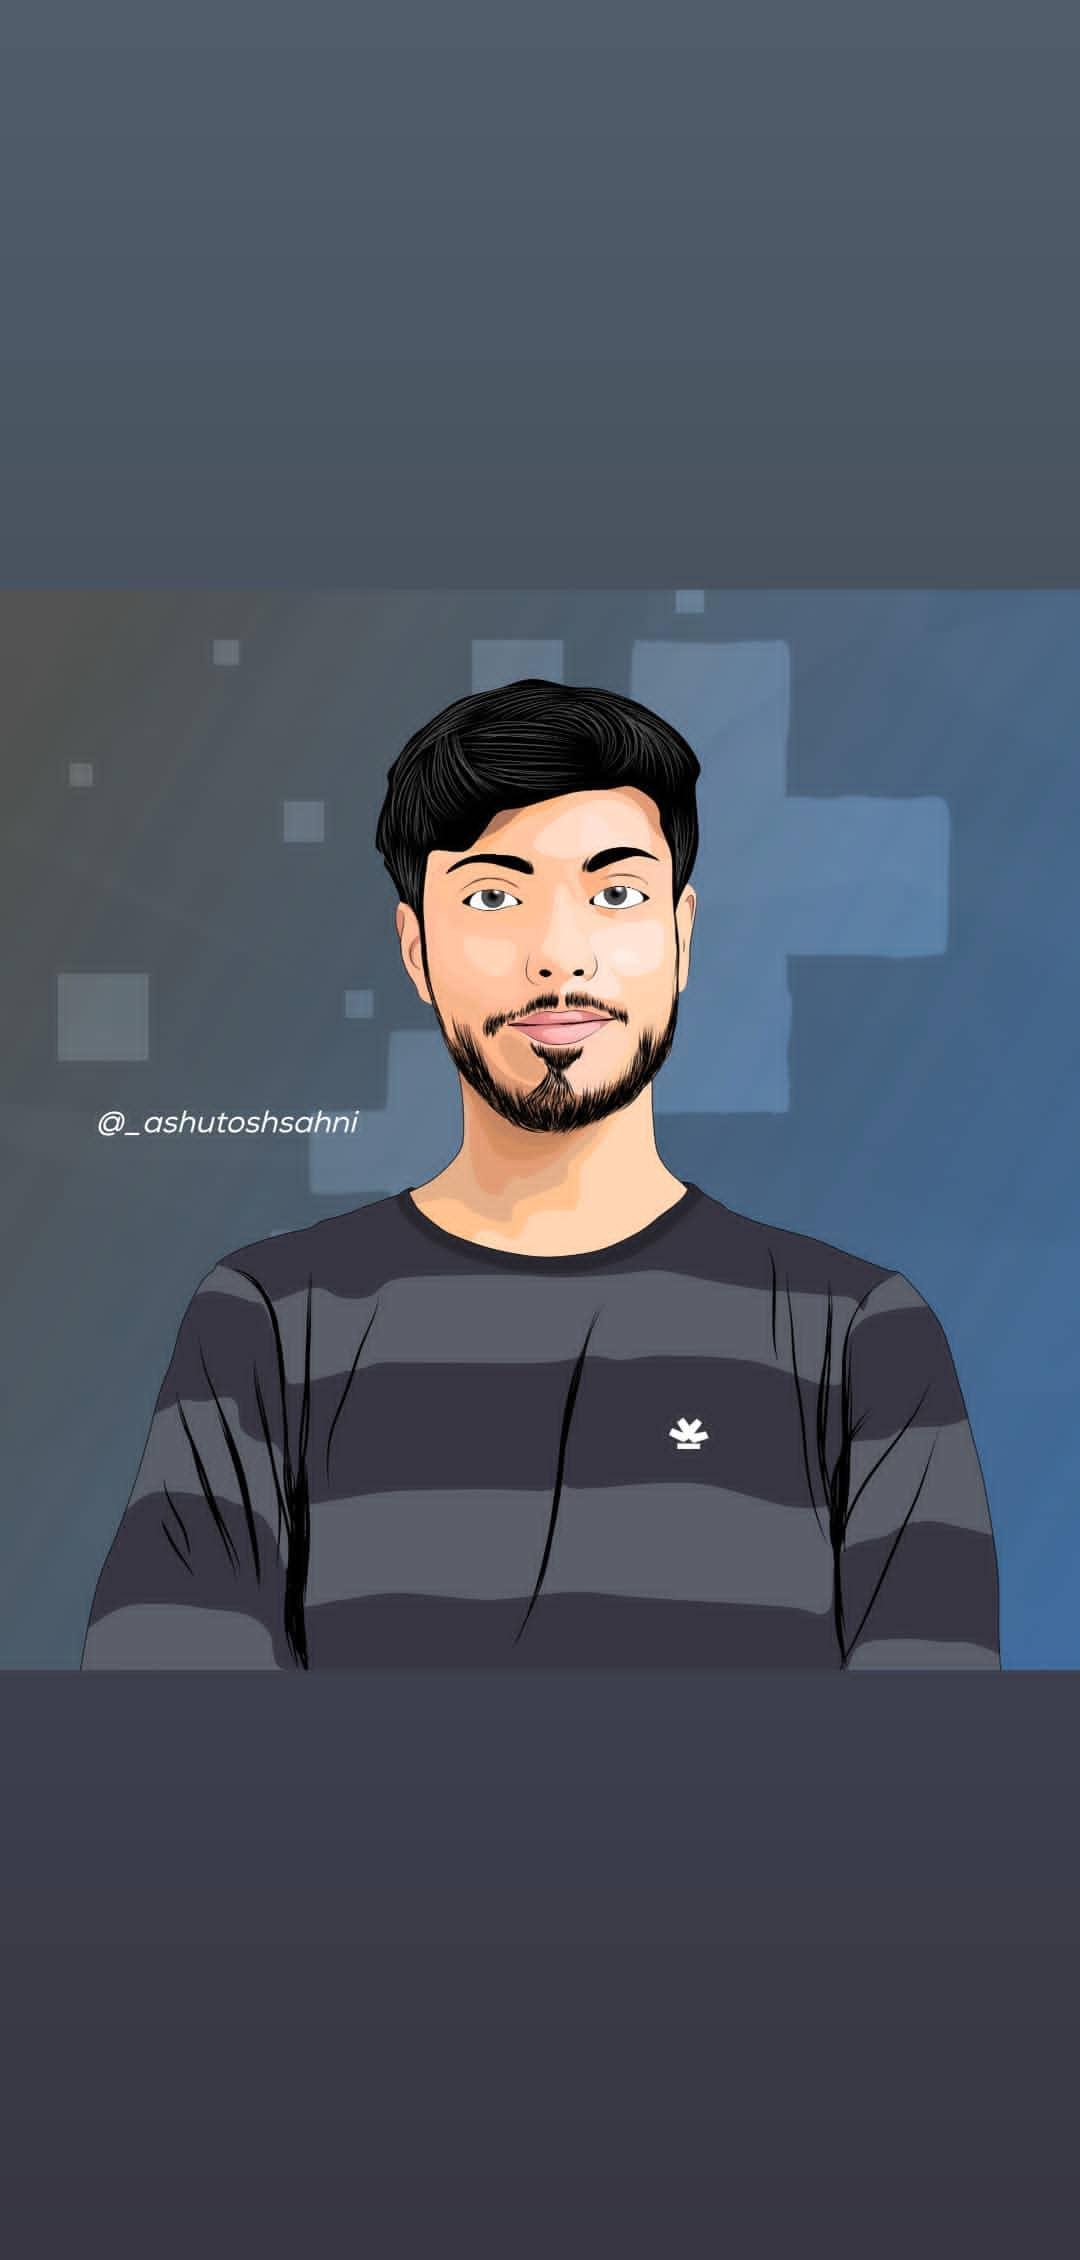 I'll Make Vector Art or Cartoon Avatar From Your Photo